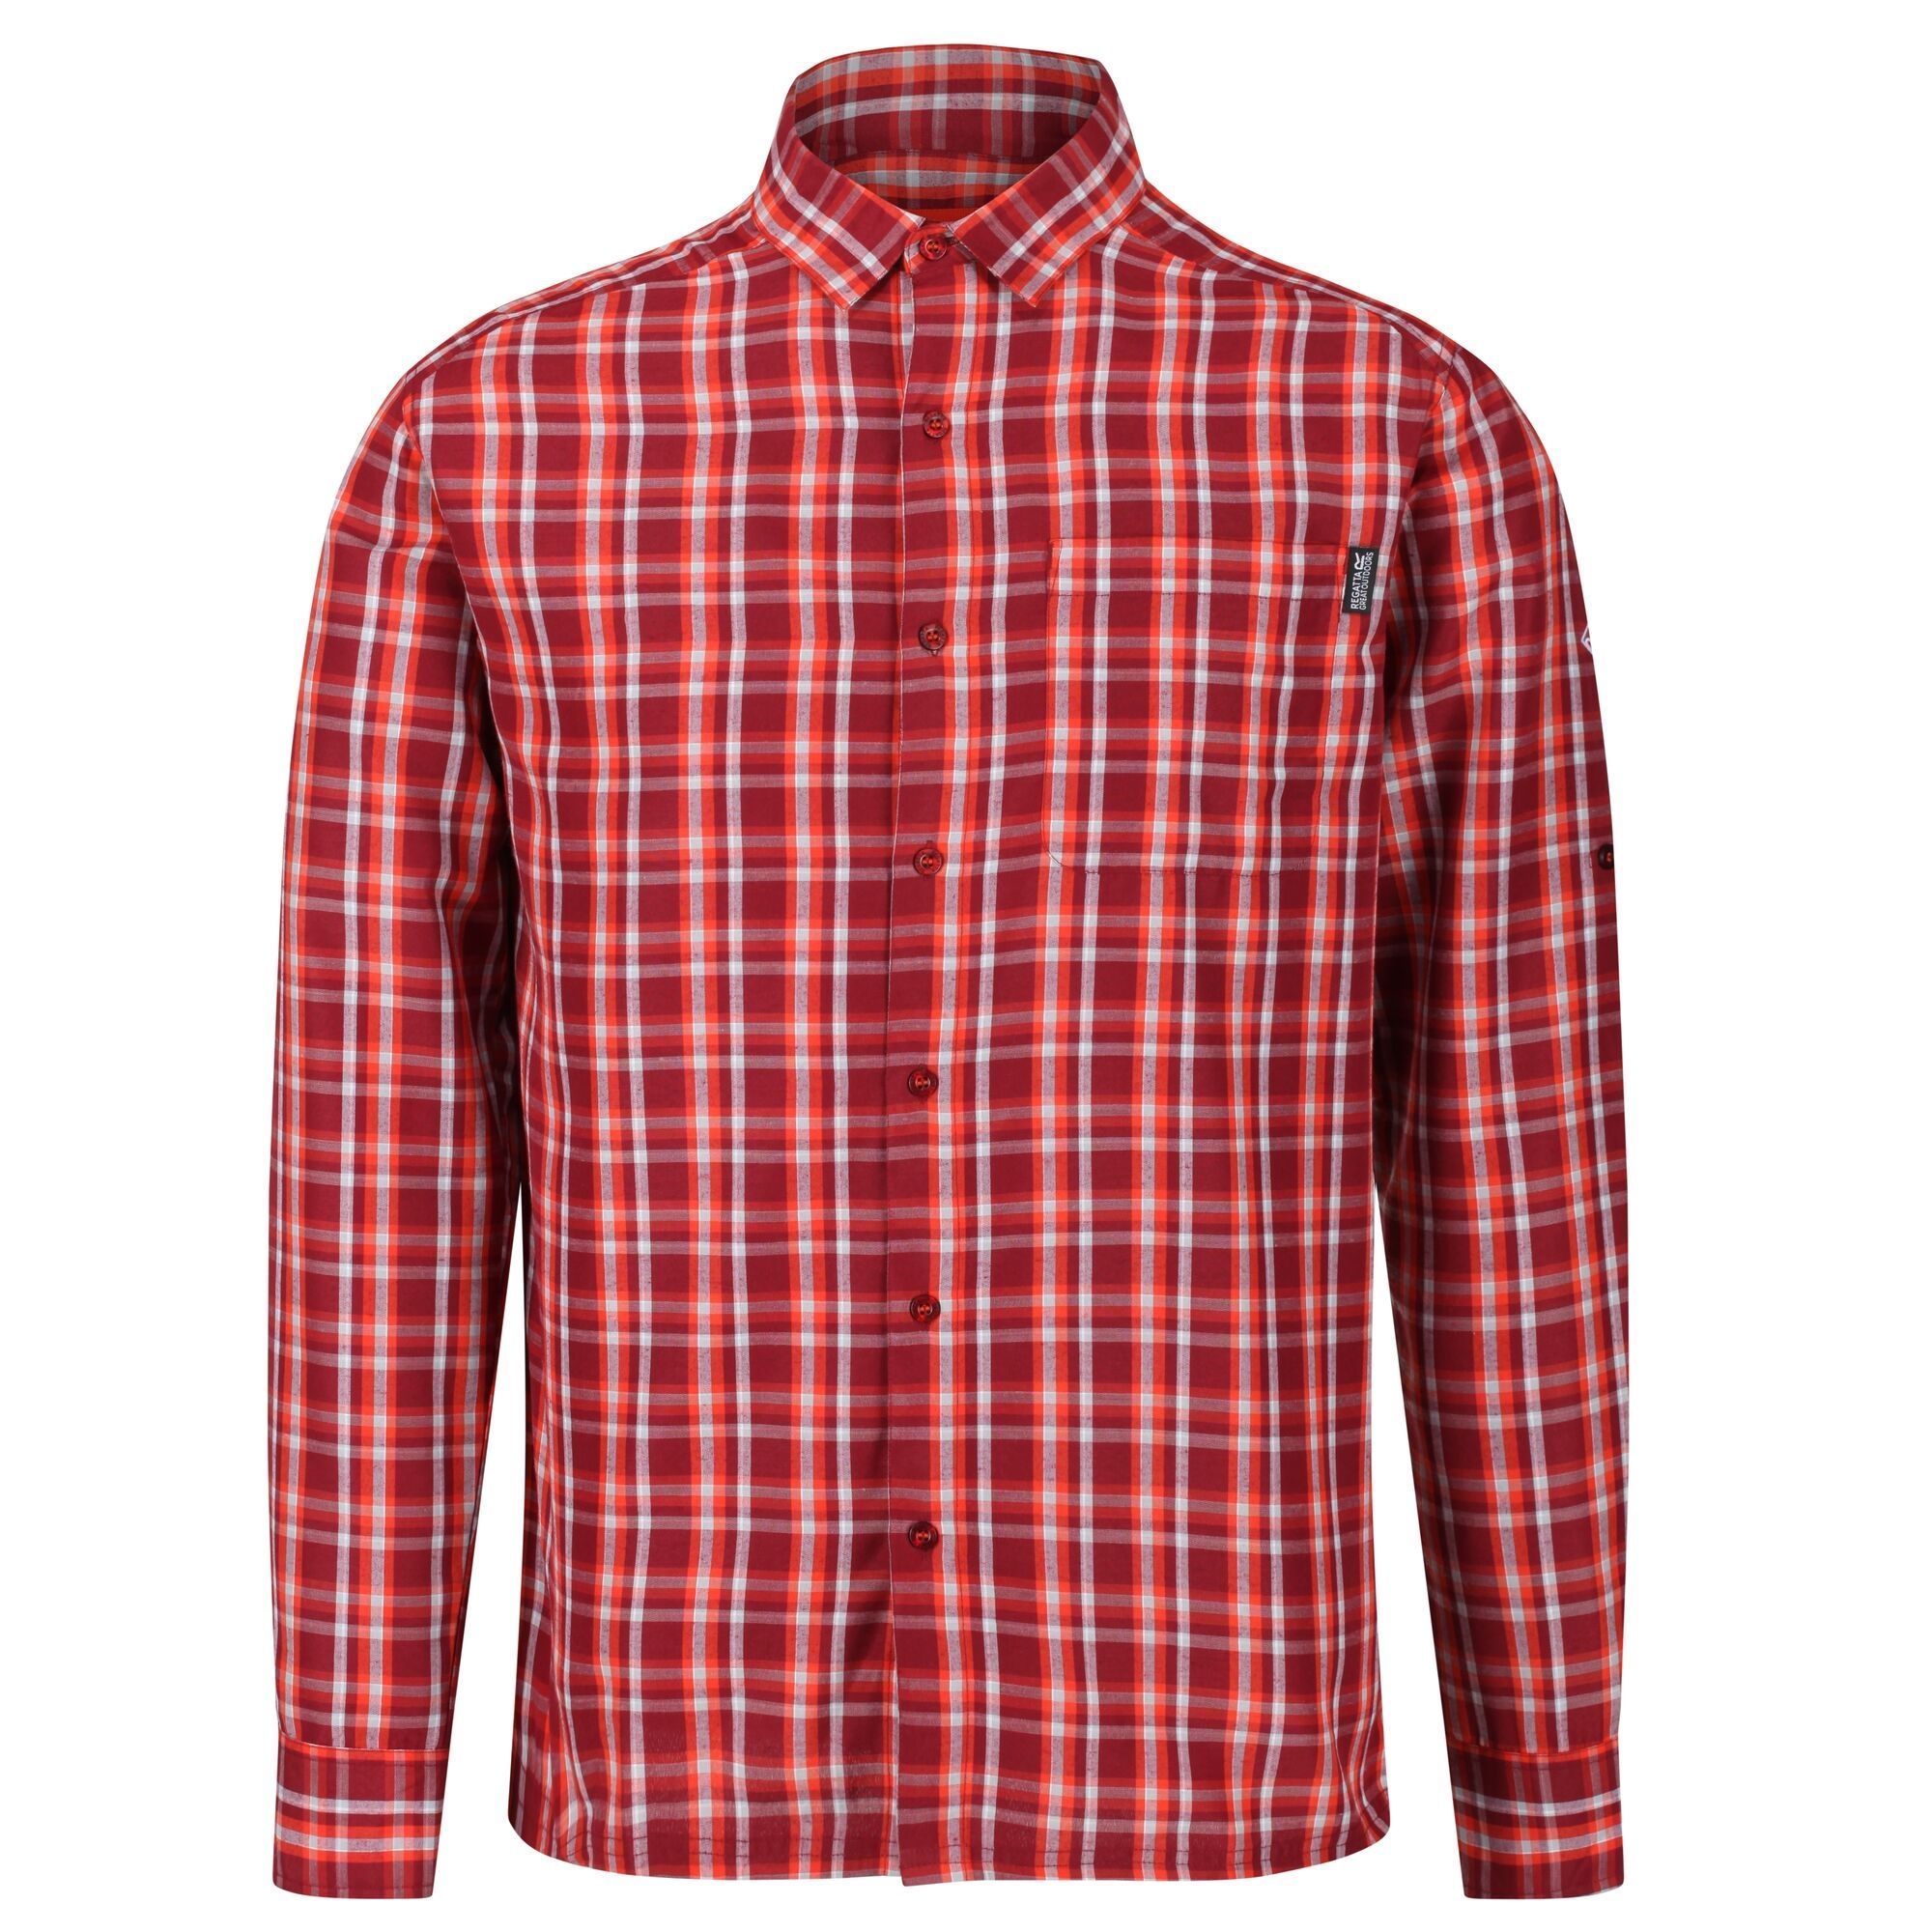 Regatta Mens Mindano III Long Sleeved Checked Shirt